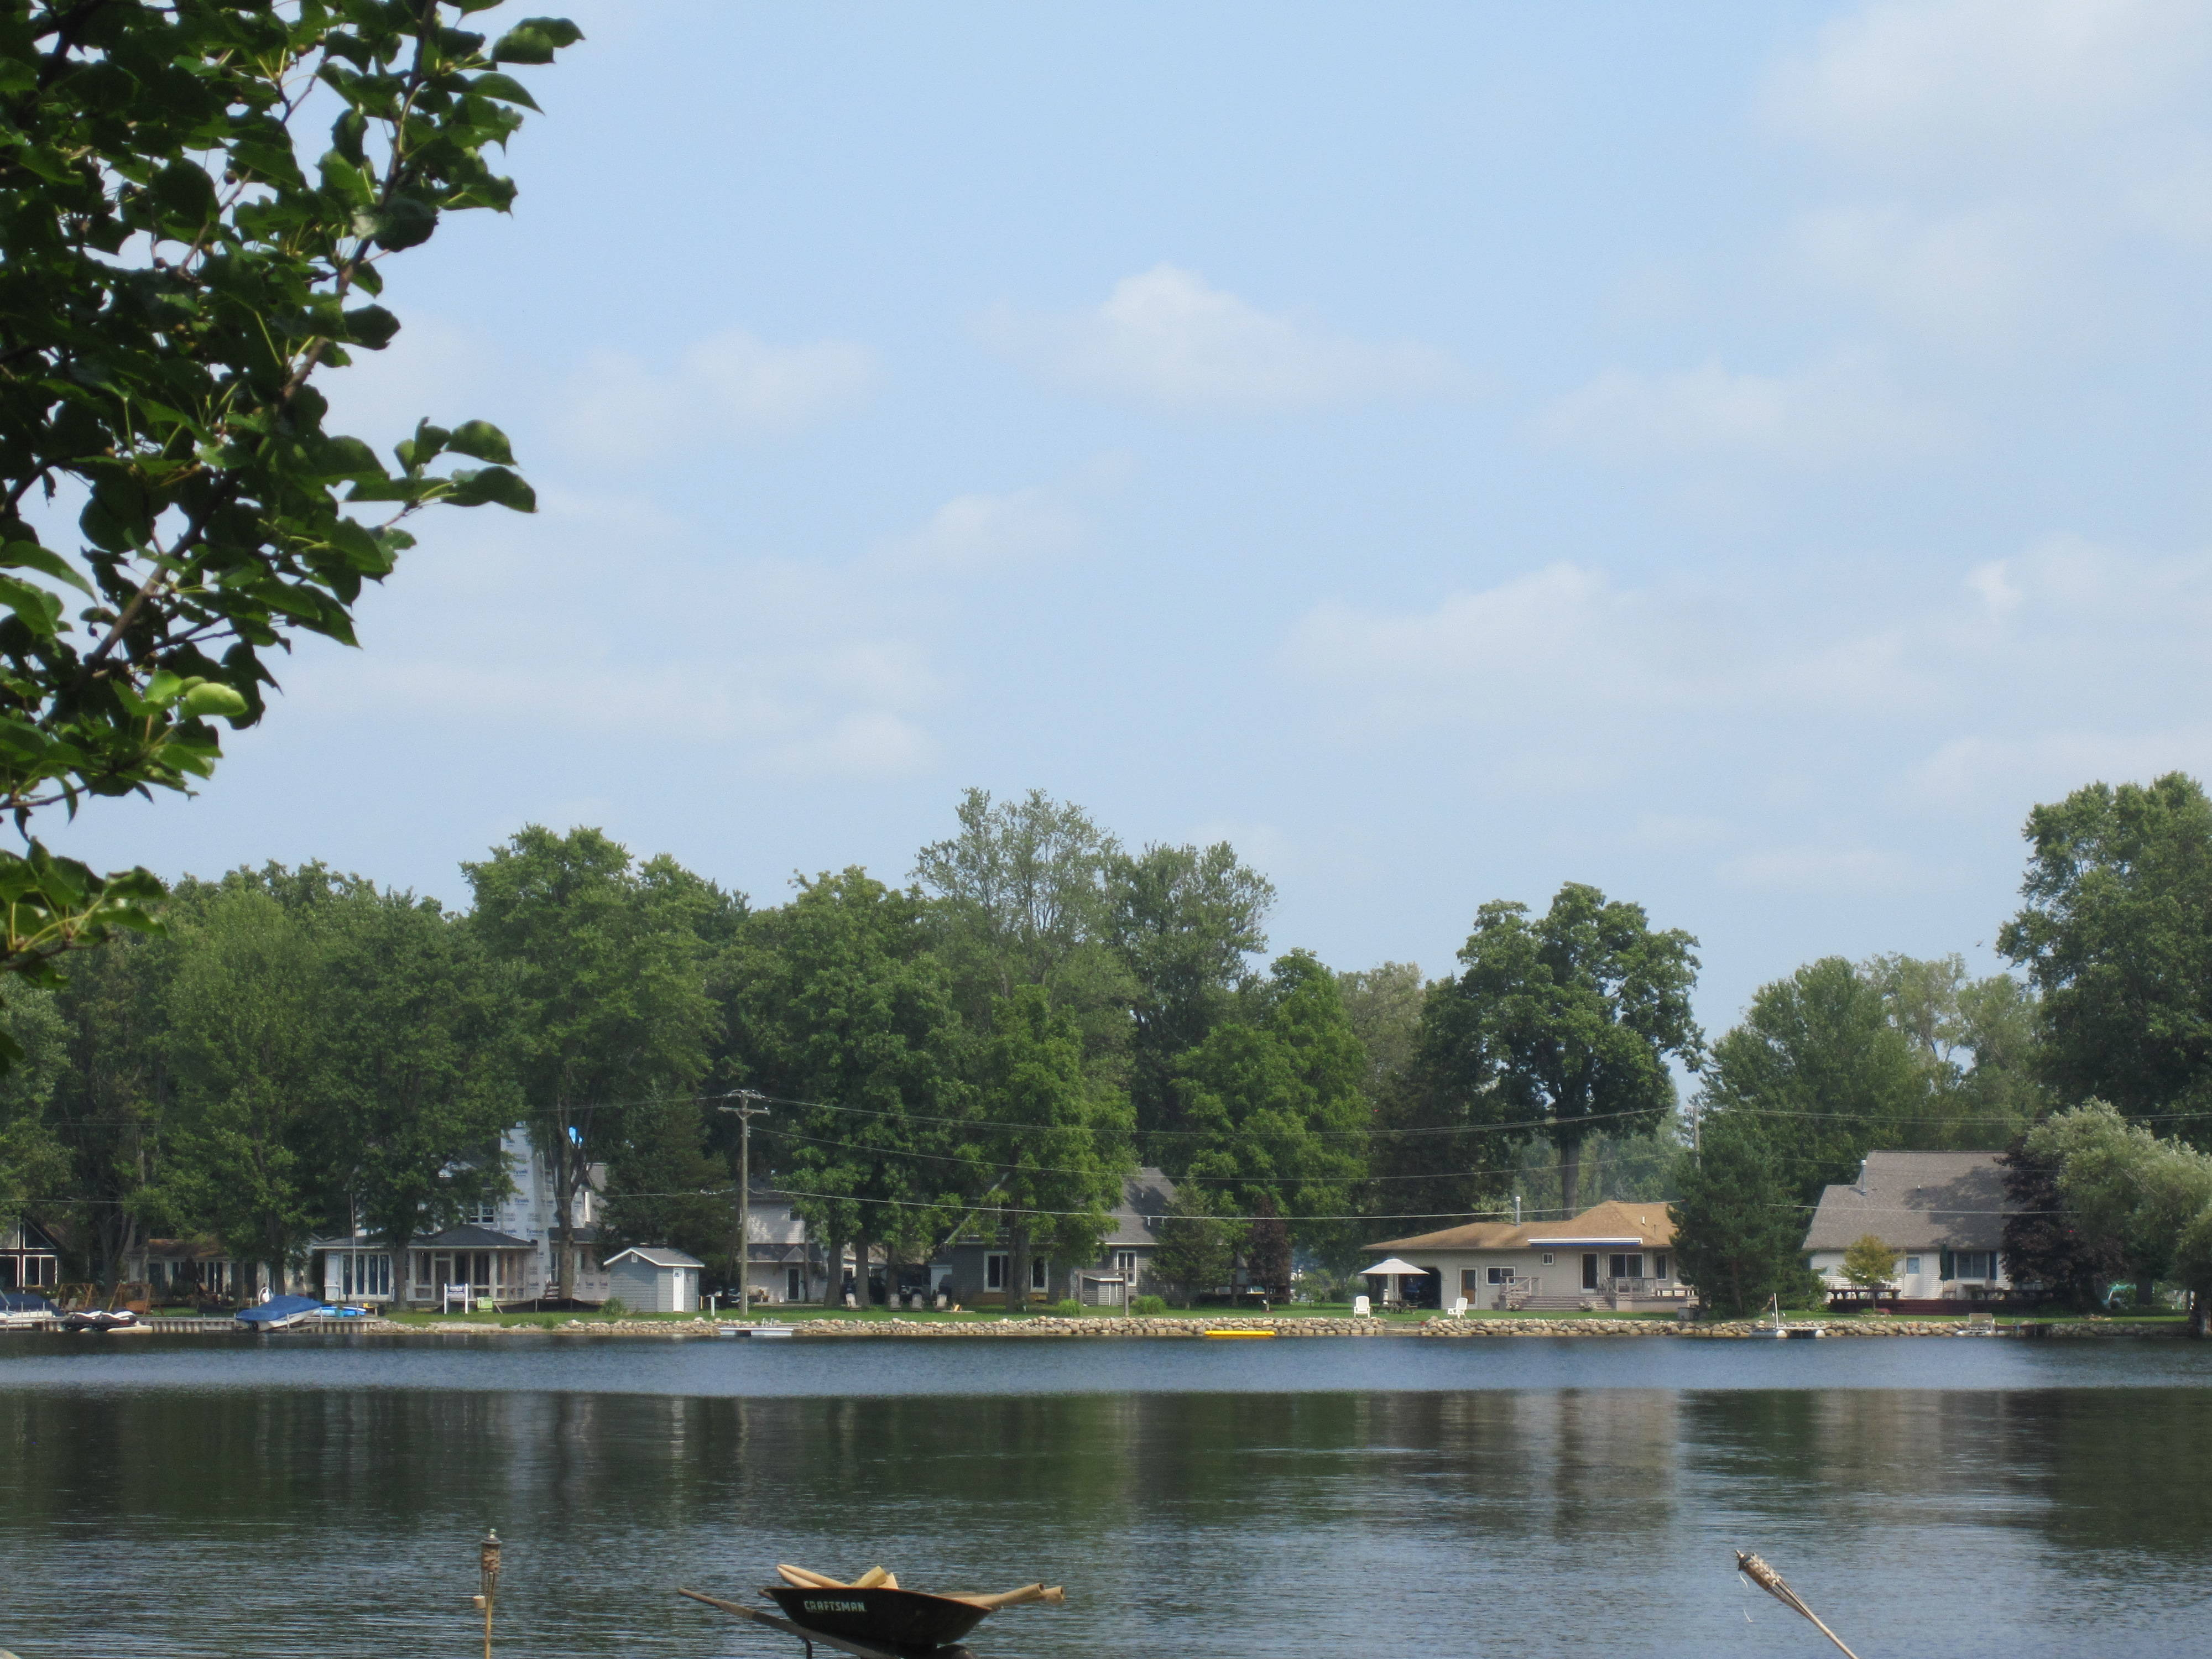 kress lake. 10255 kress rd, pinckney, mi 48169 strawberry lake on the chain of lakes